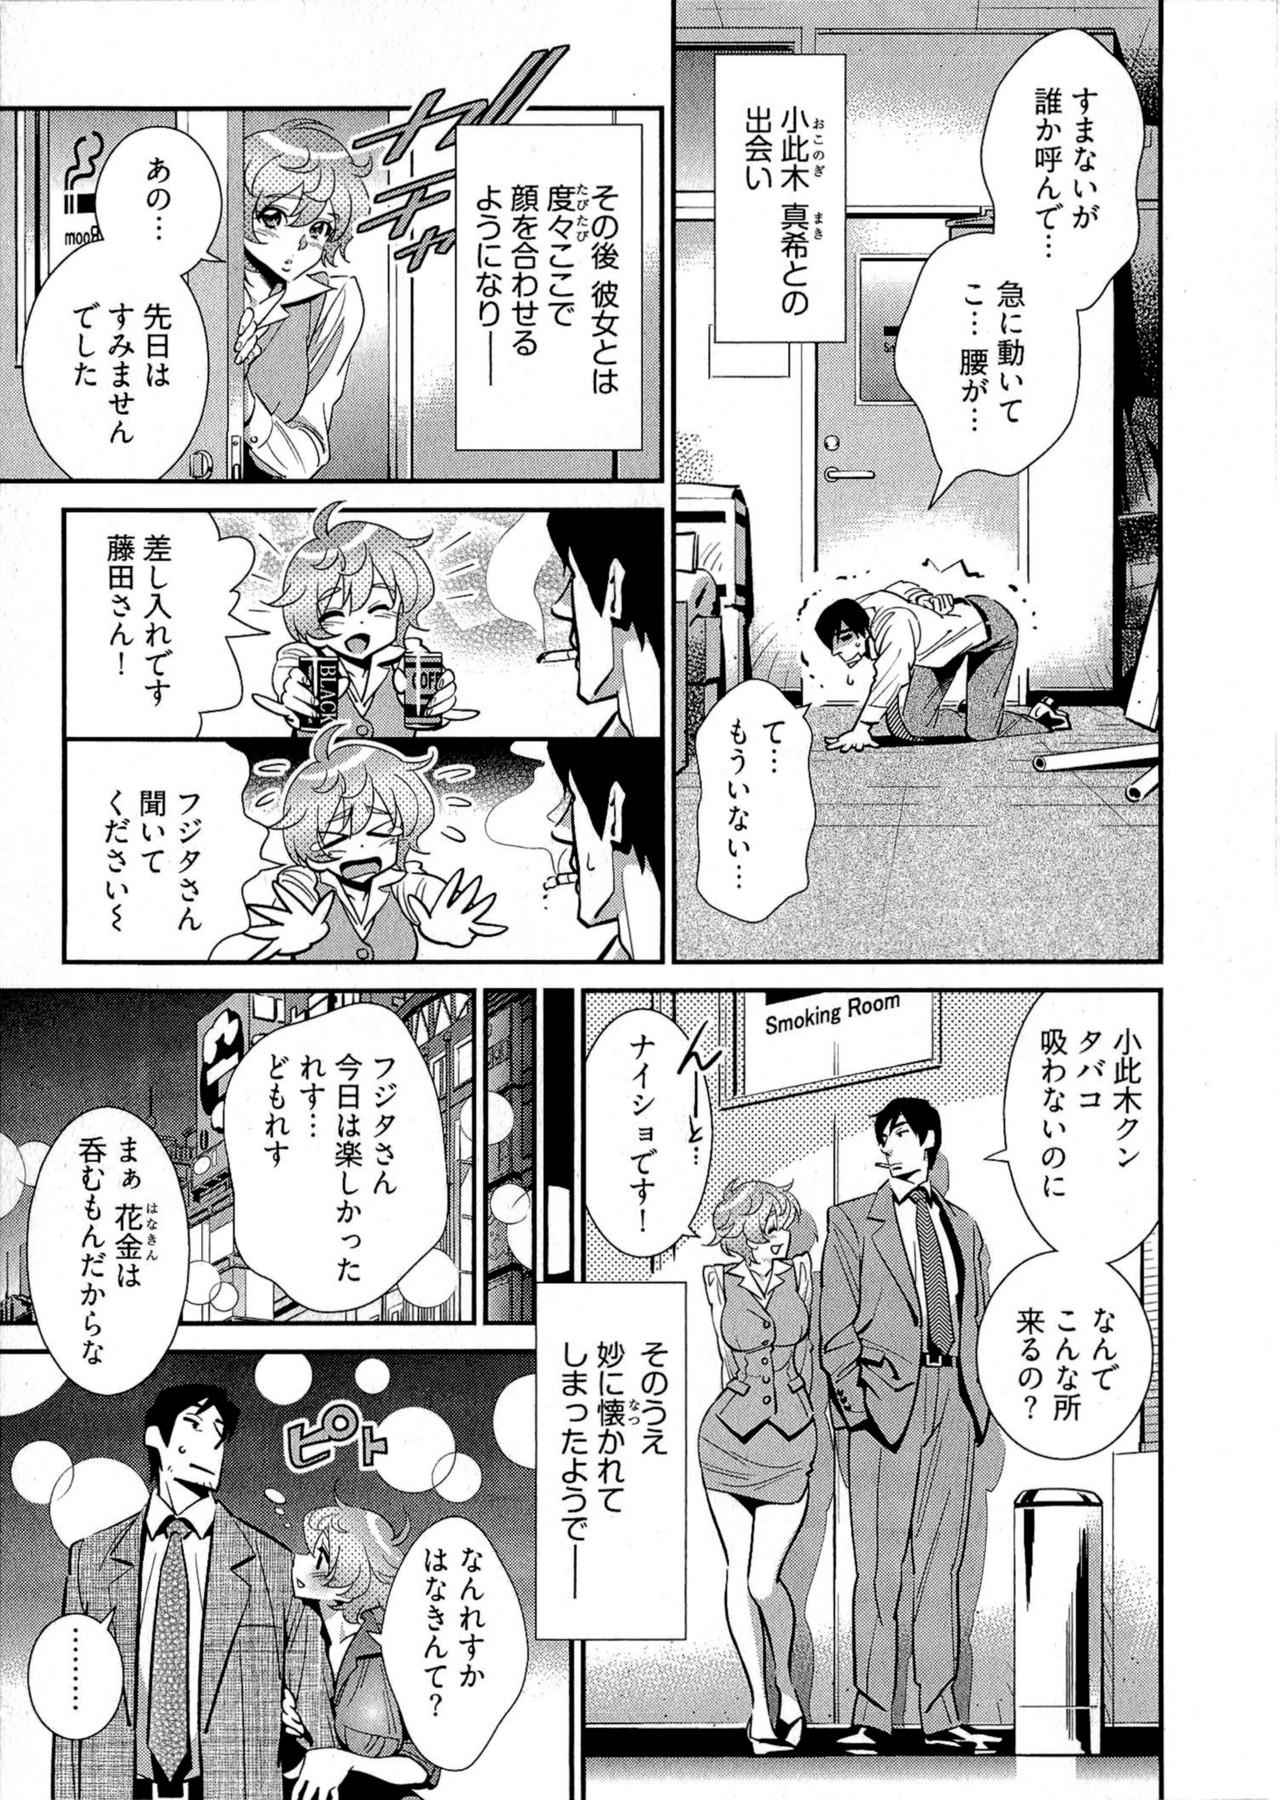 5ji kara Honban! - After Five Working! 11